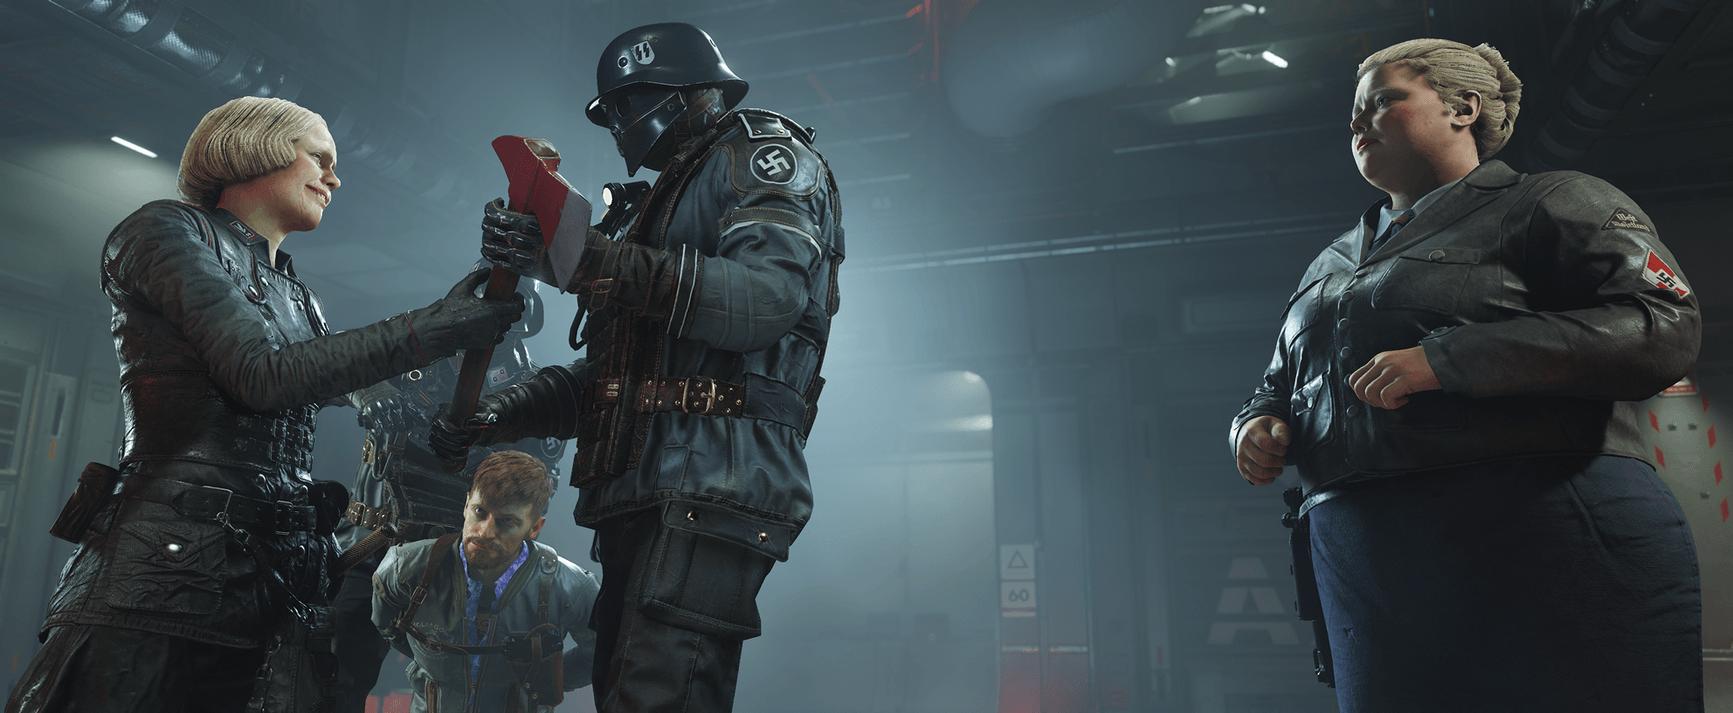 Test de Wolfenstein II: The New Colossus : oui, on aime toujours tuer des nazis - Pop culture - Numerama